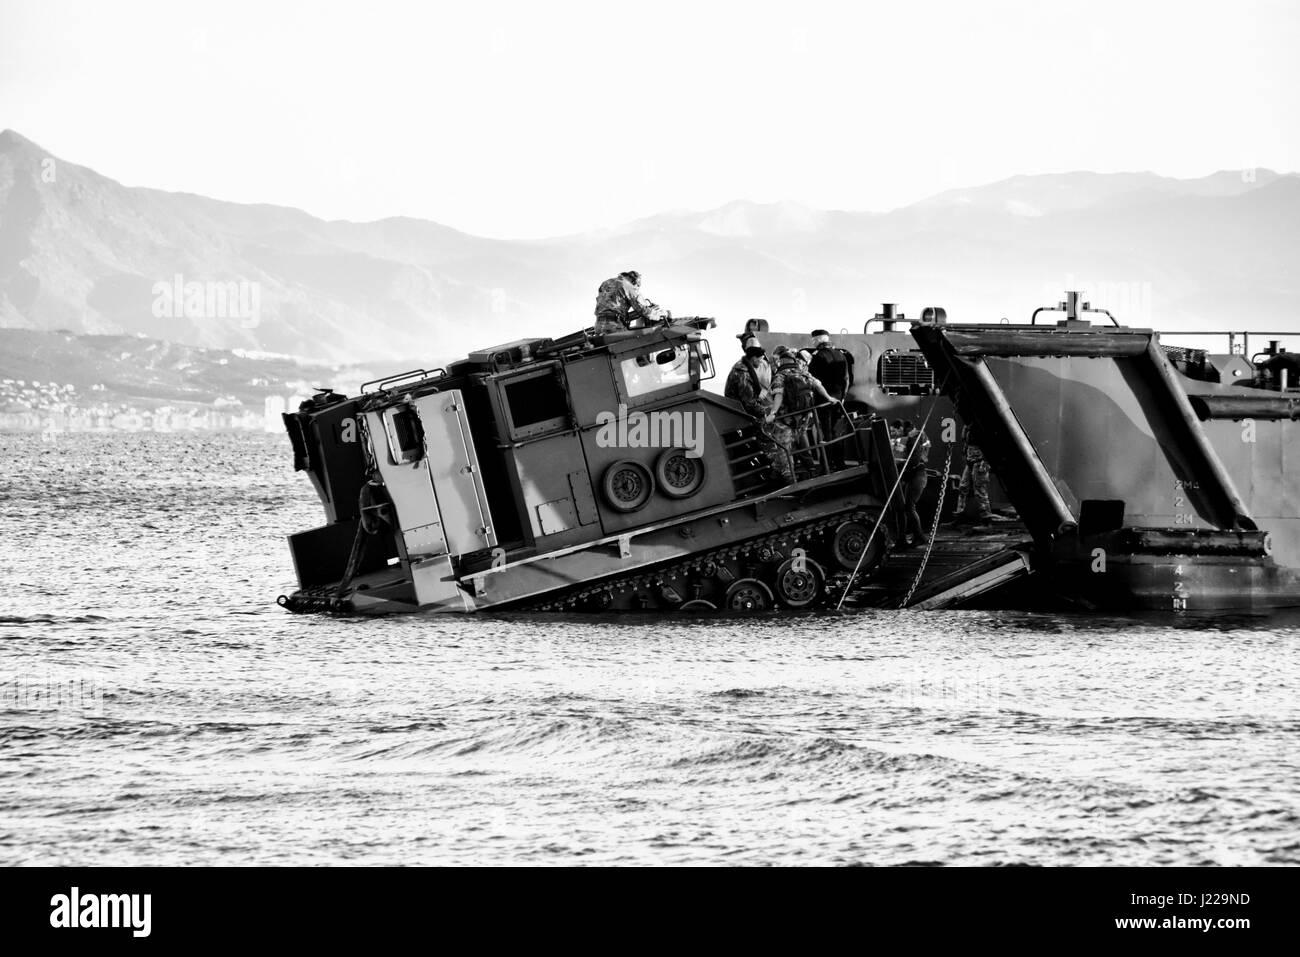 Royal Marines amphibious landings at Eastern Beach in Gibraltar. Photographer Stephen Ignacio at Eastern Beach, - Stock Image